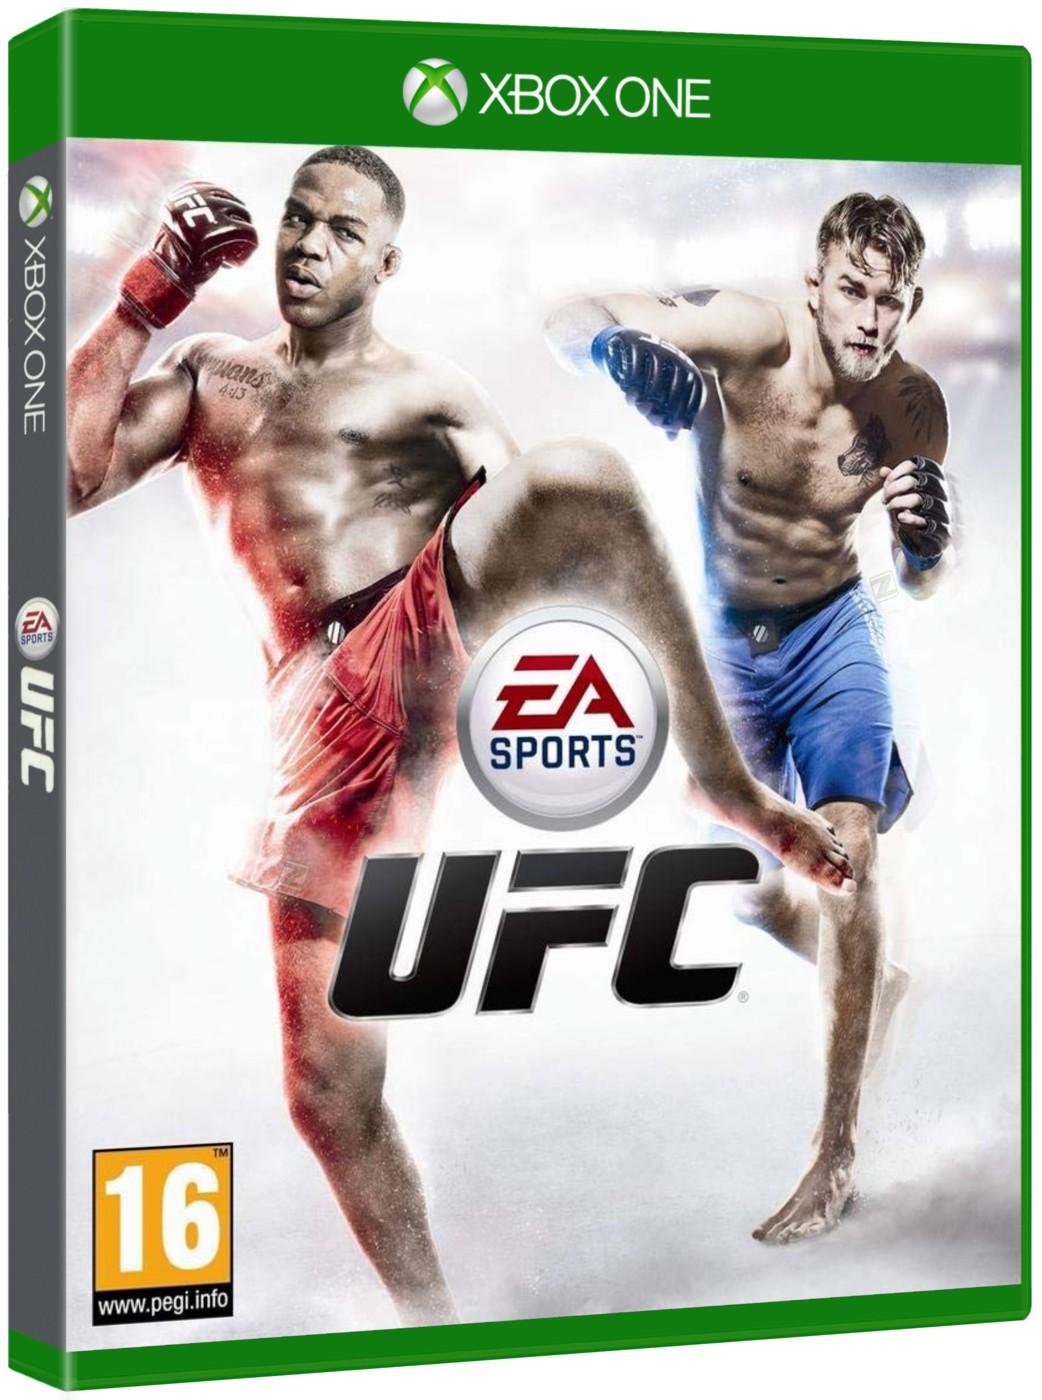 EA SPORTS UFC - Xone